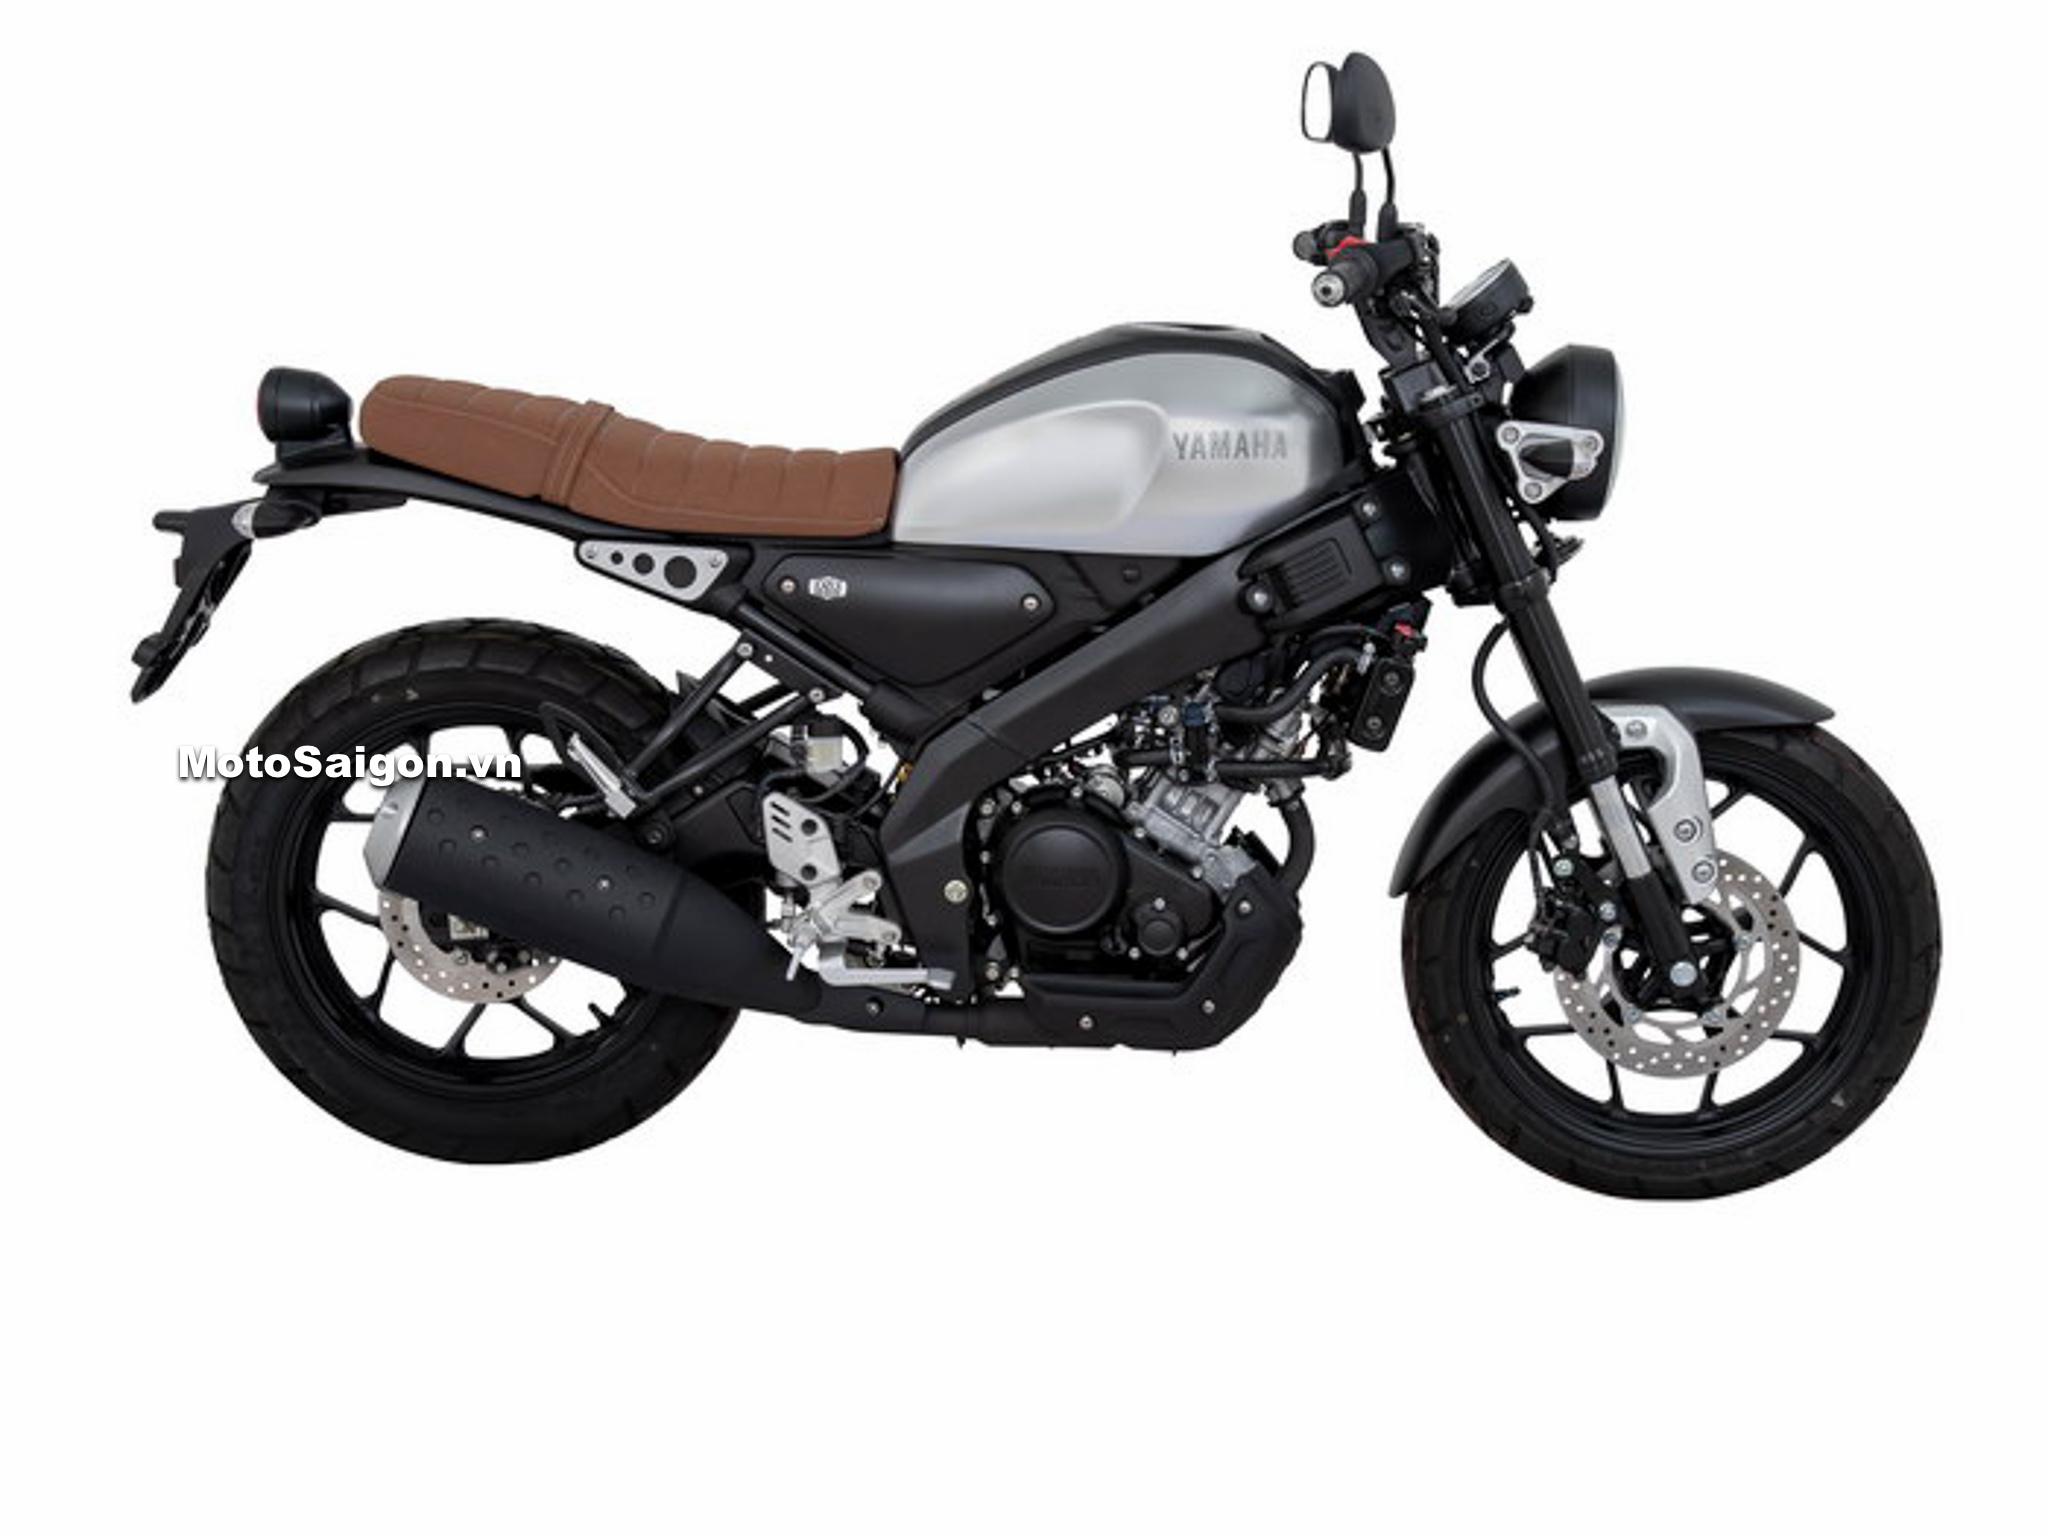 Yamaha XSR155 Premium màu Nâu Xám Grey-Brown